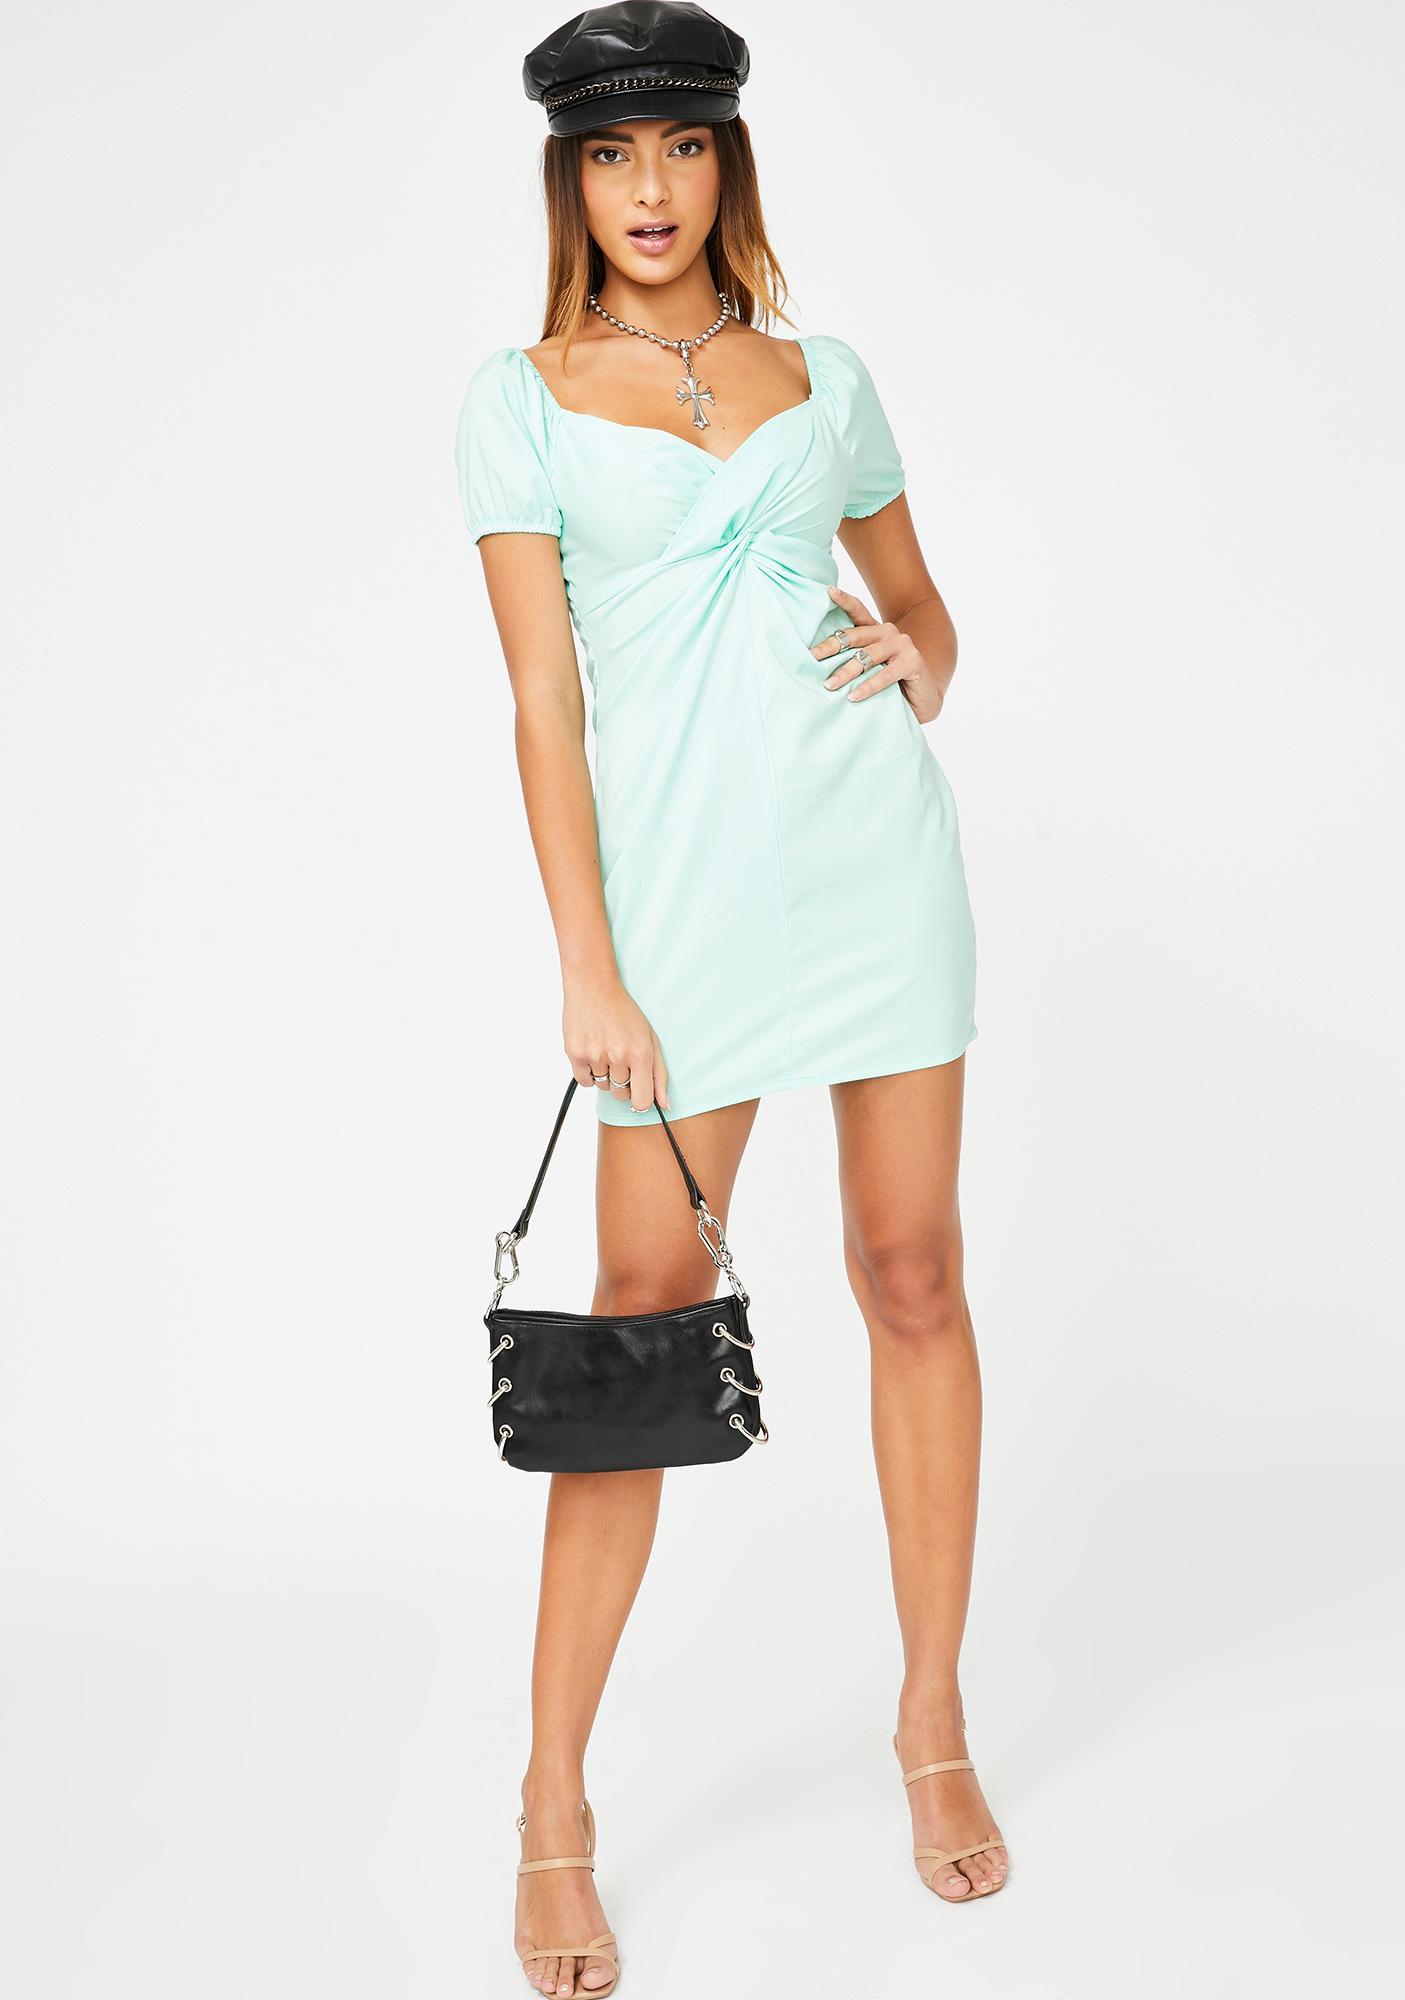 ZEMETA Mint Swirl Dress